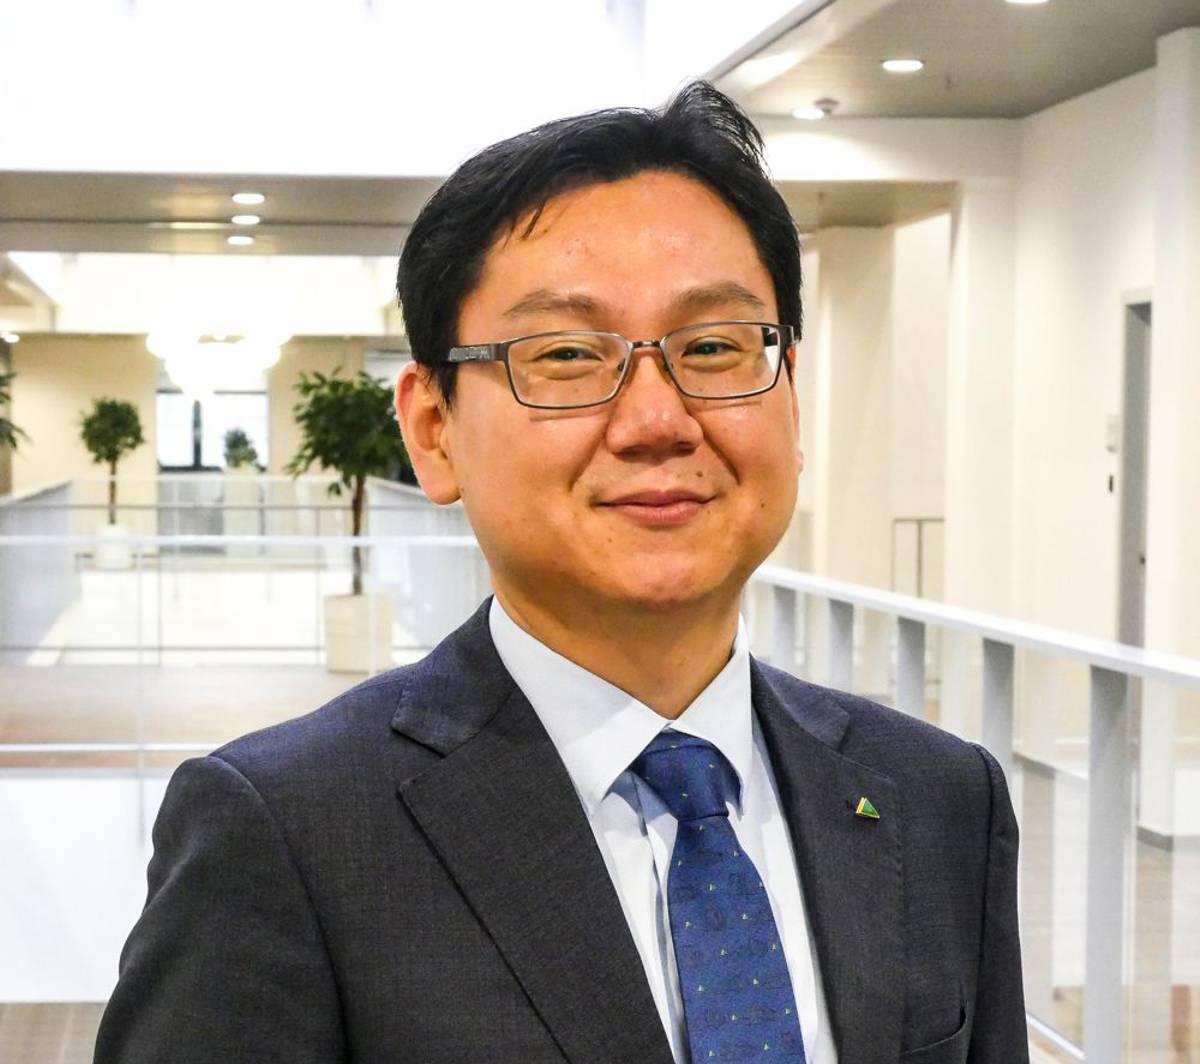 Hyundai Construction Equipment Europe welcomes new MD Jongho Chun